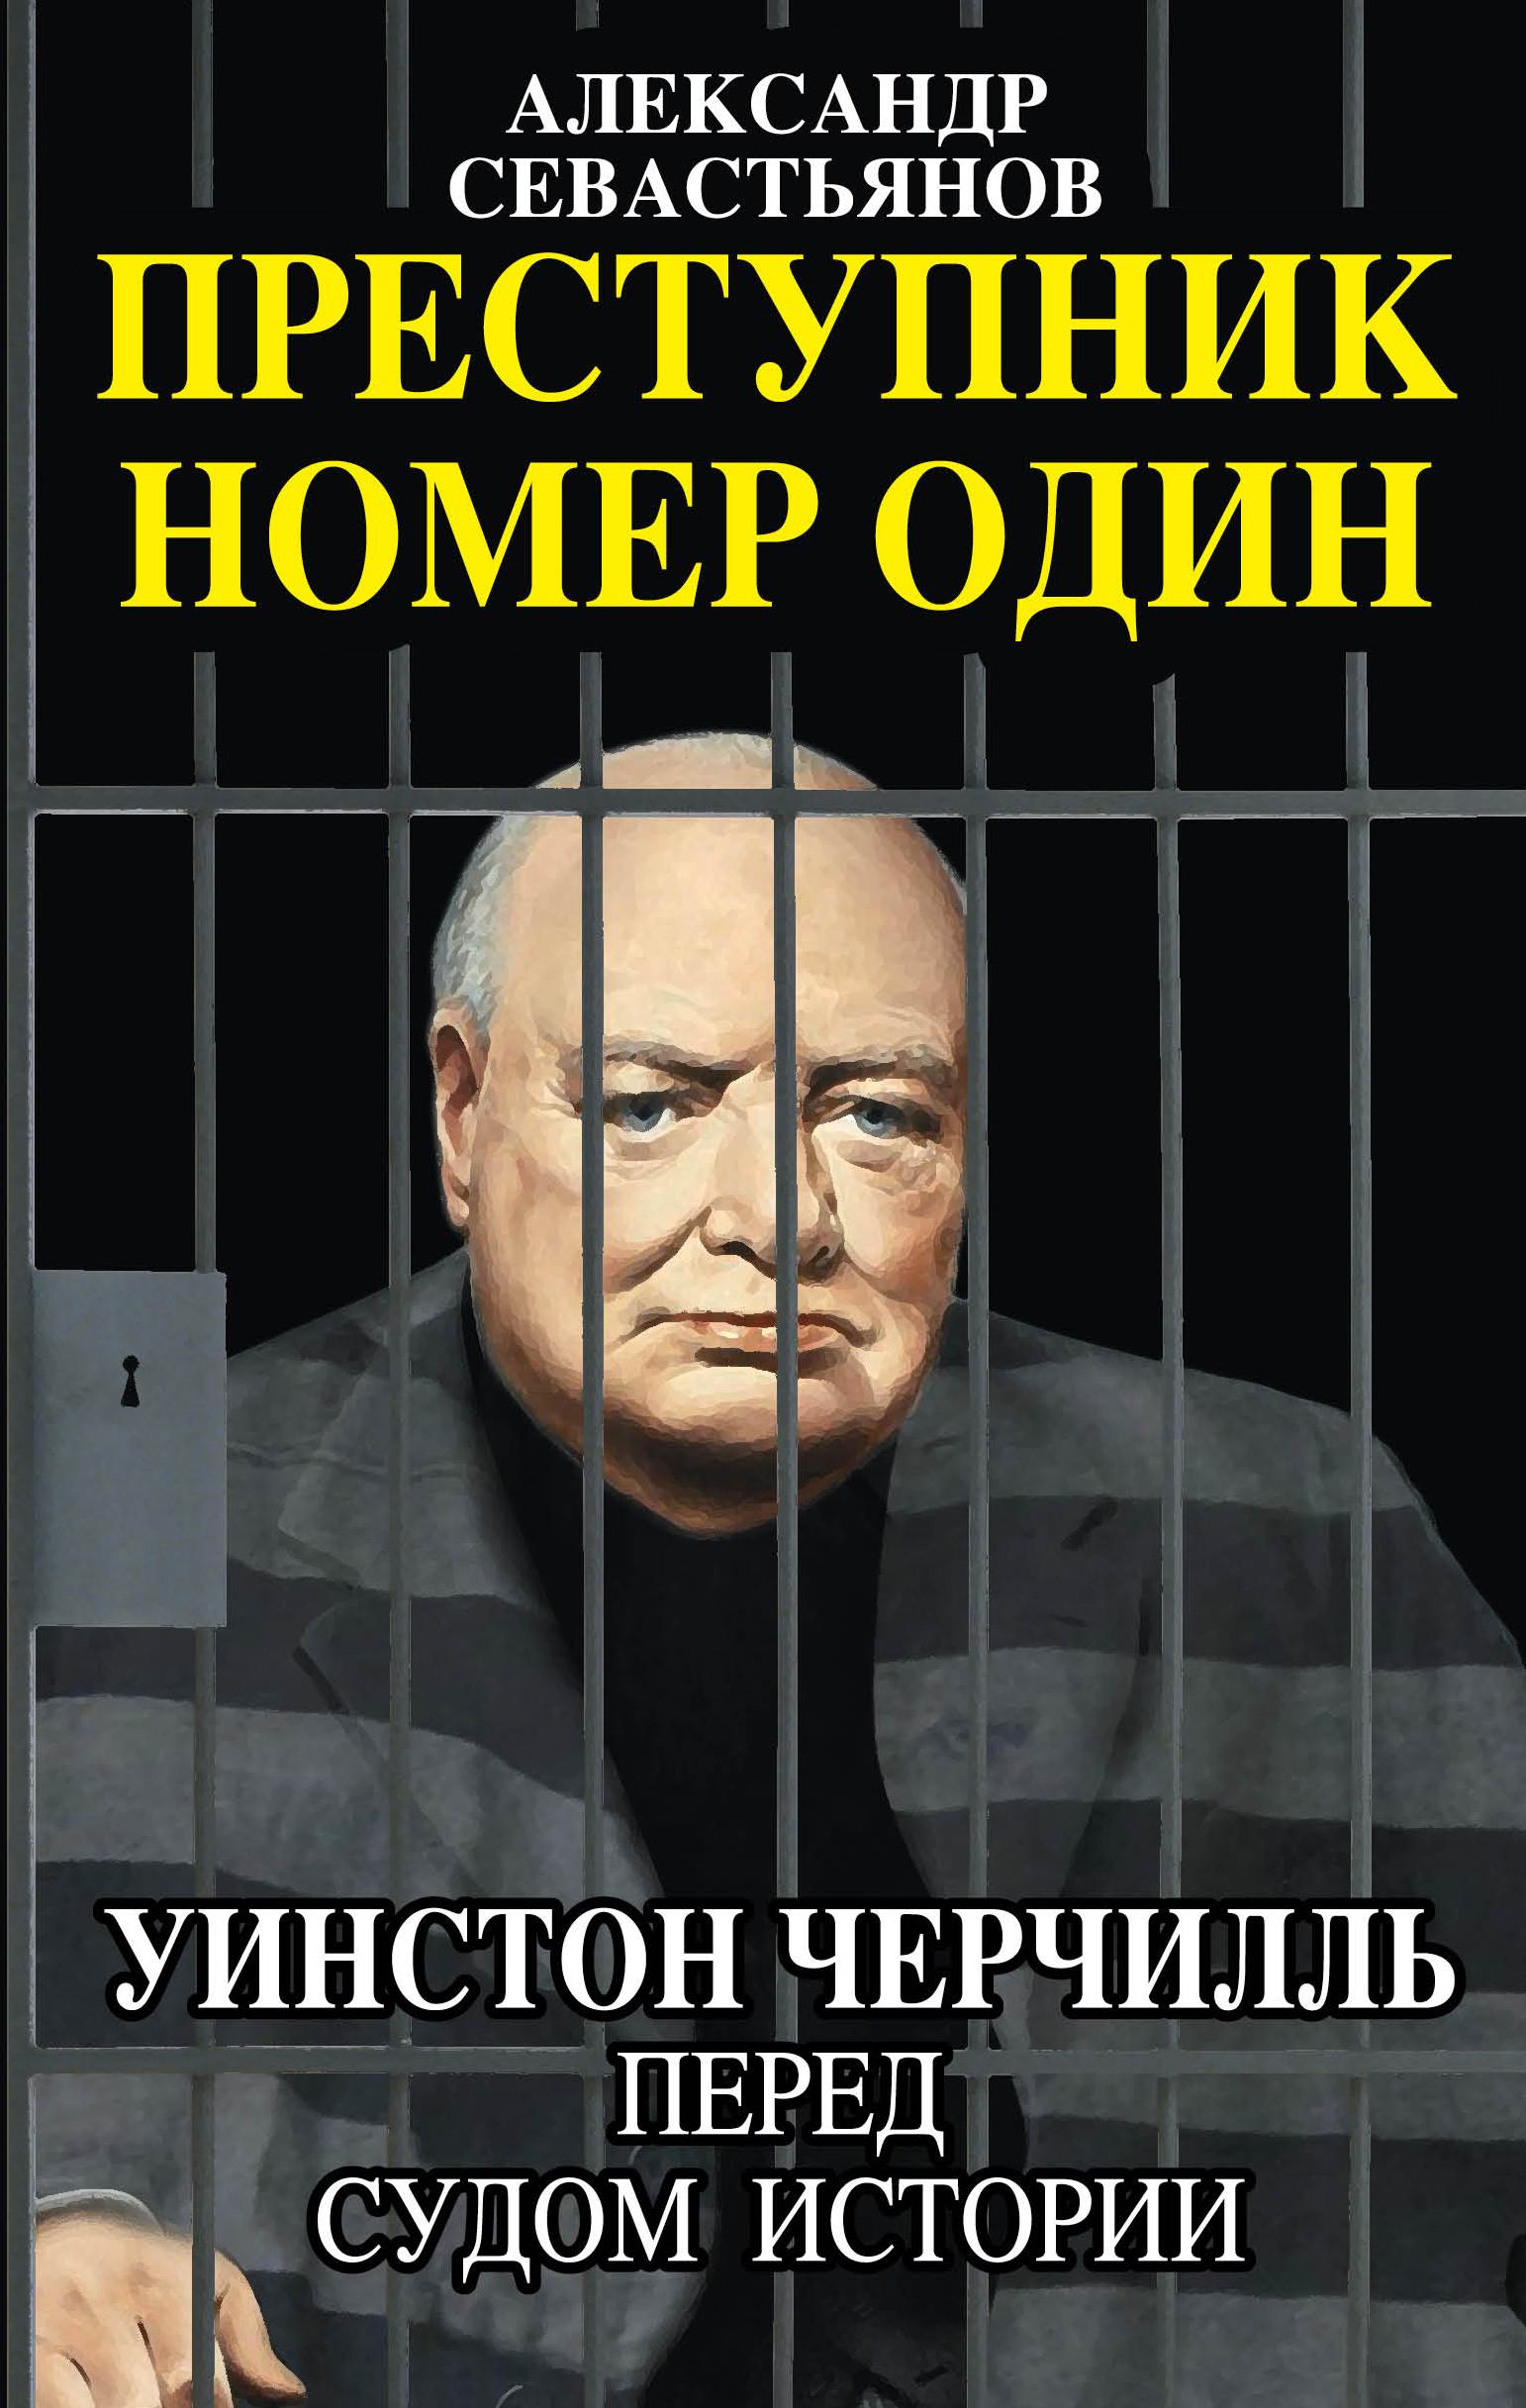 Александр Севастьянов Преступник номер один. Уинстон Черчилль перед судом Истории